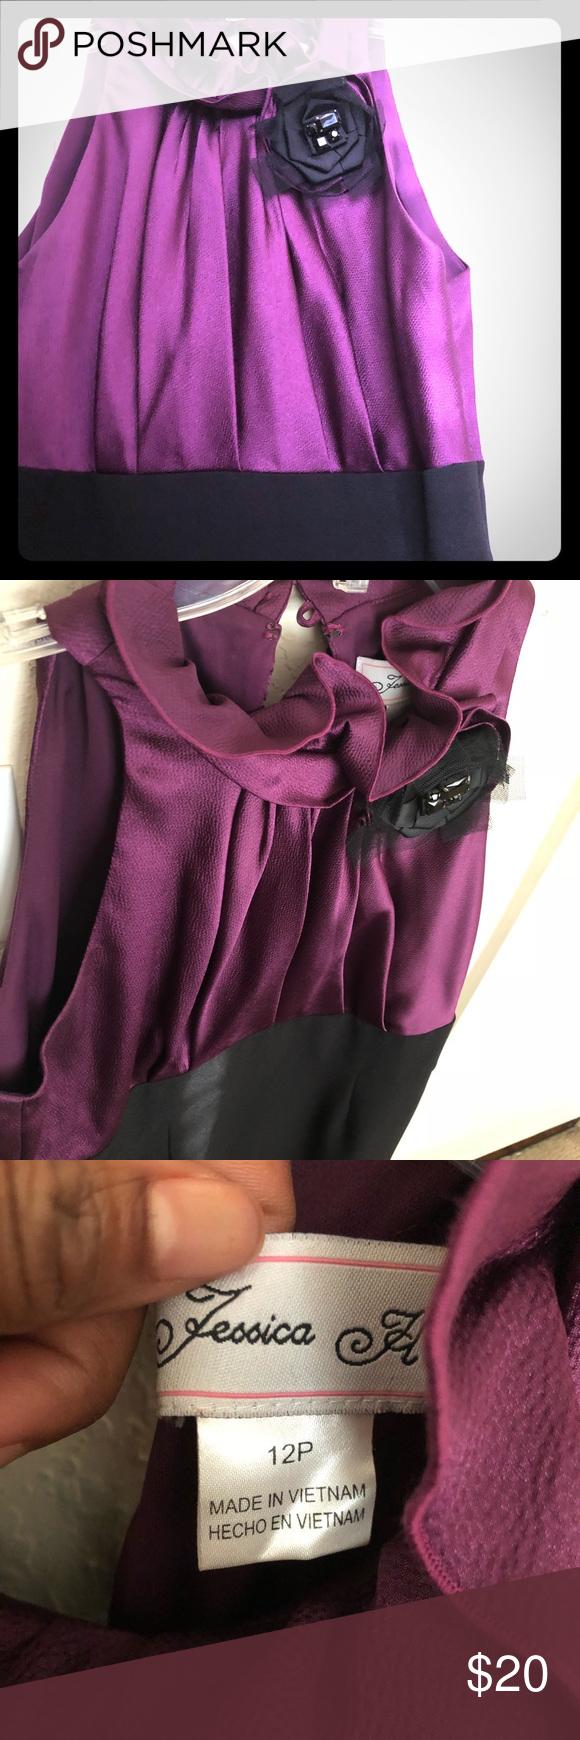 YOURS💥Jessica Howard💥petite sleeveless dress